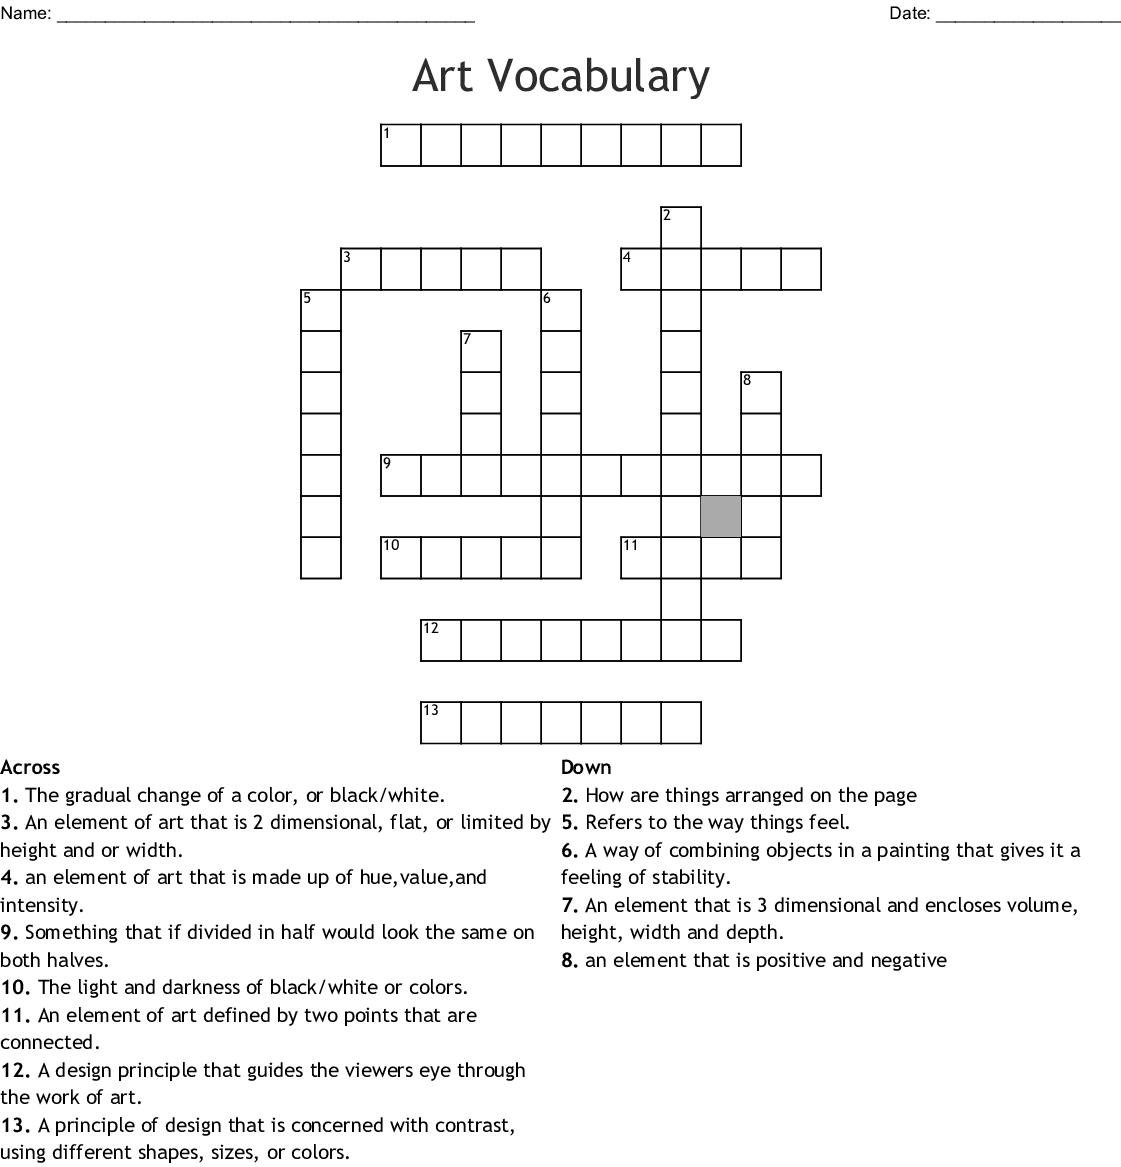 Elements Of Art Amp Principles Of Design Crossword